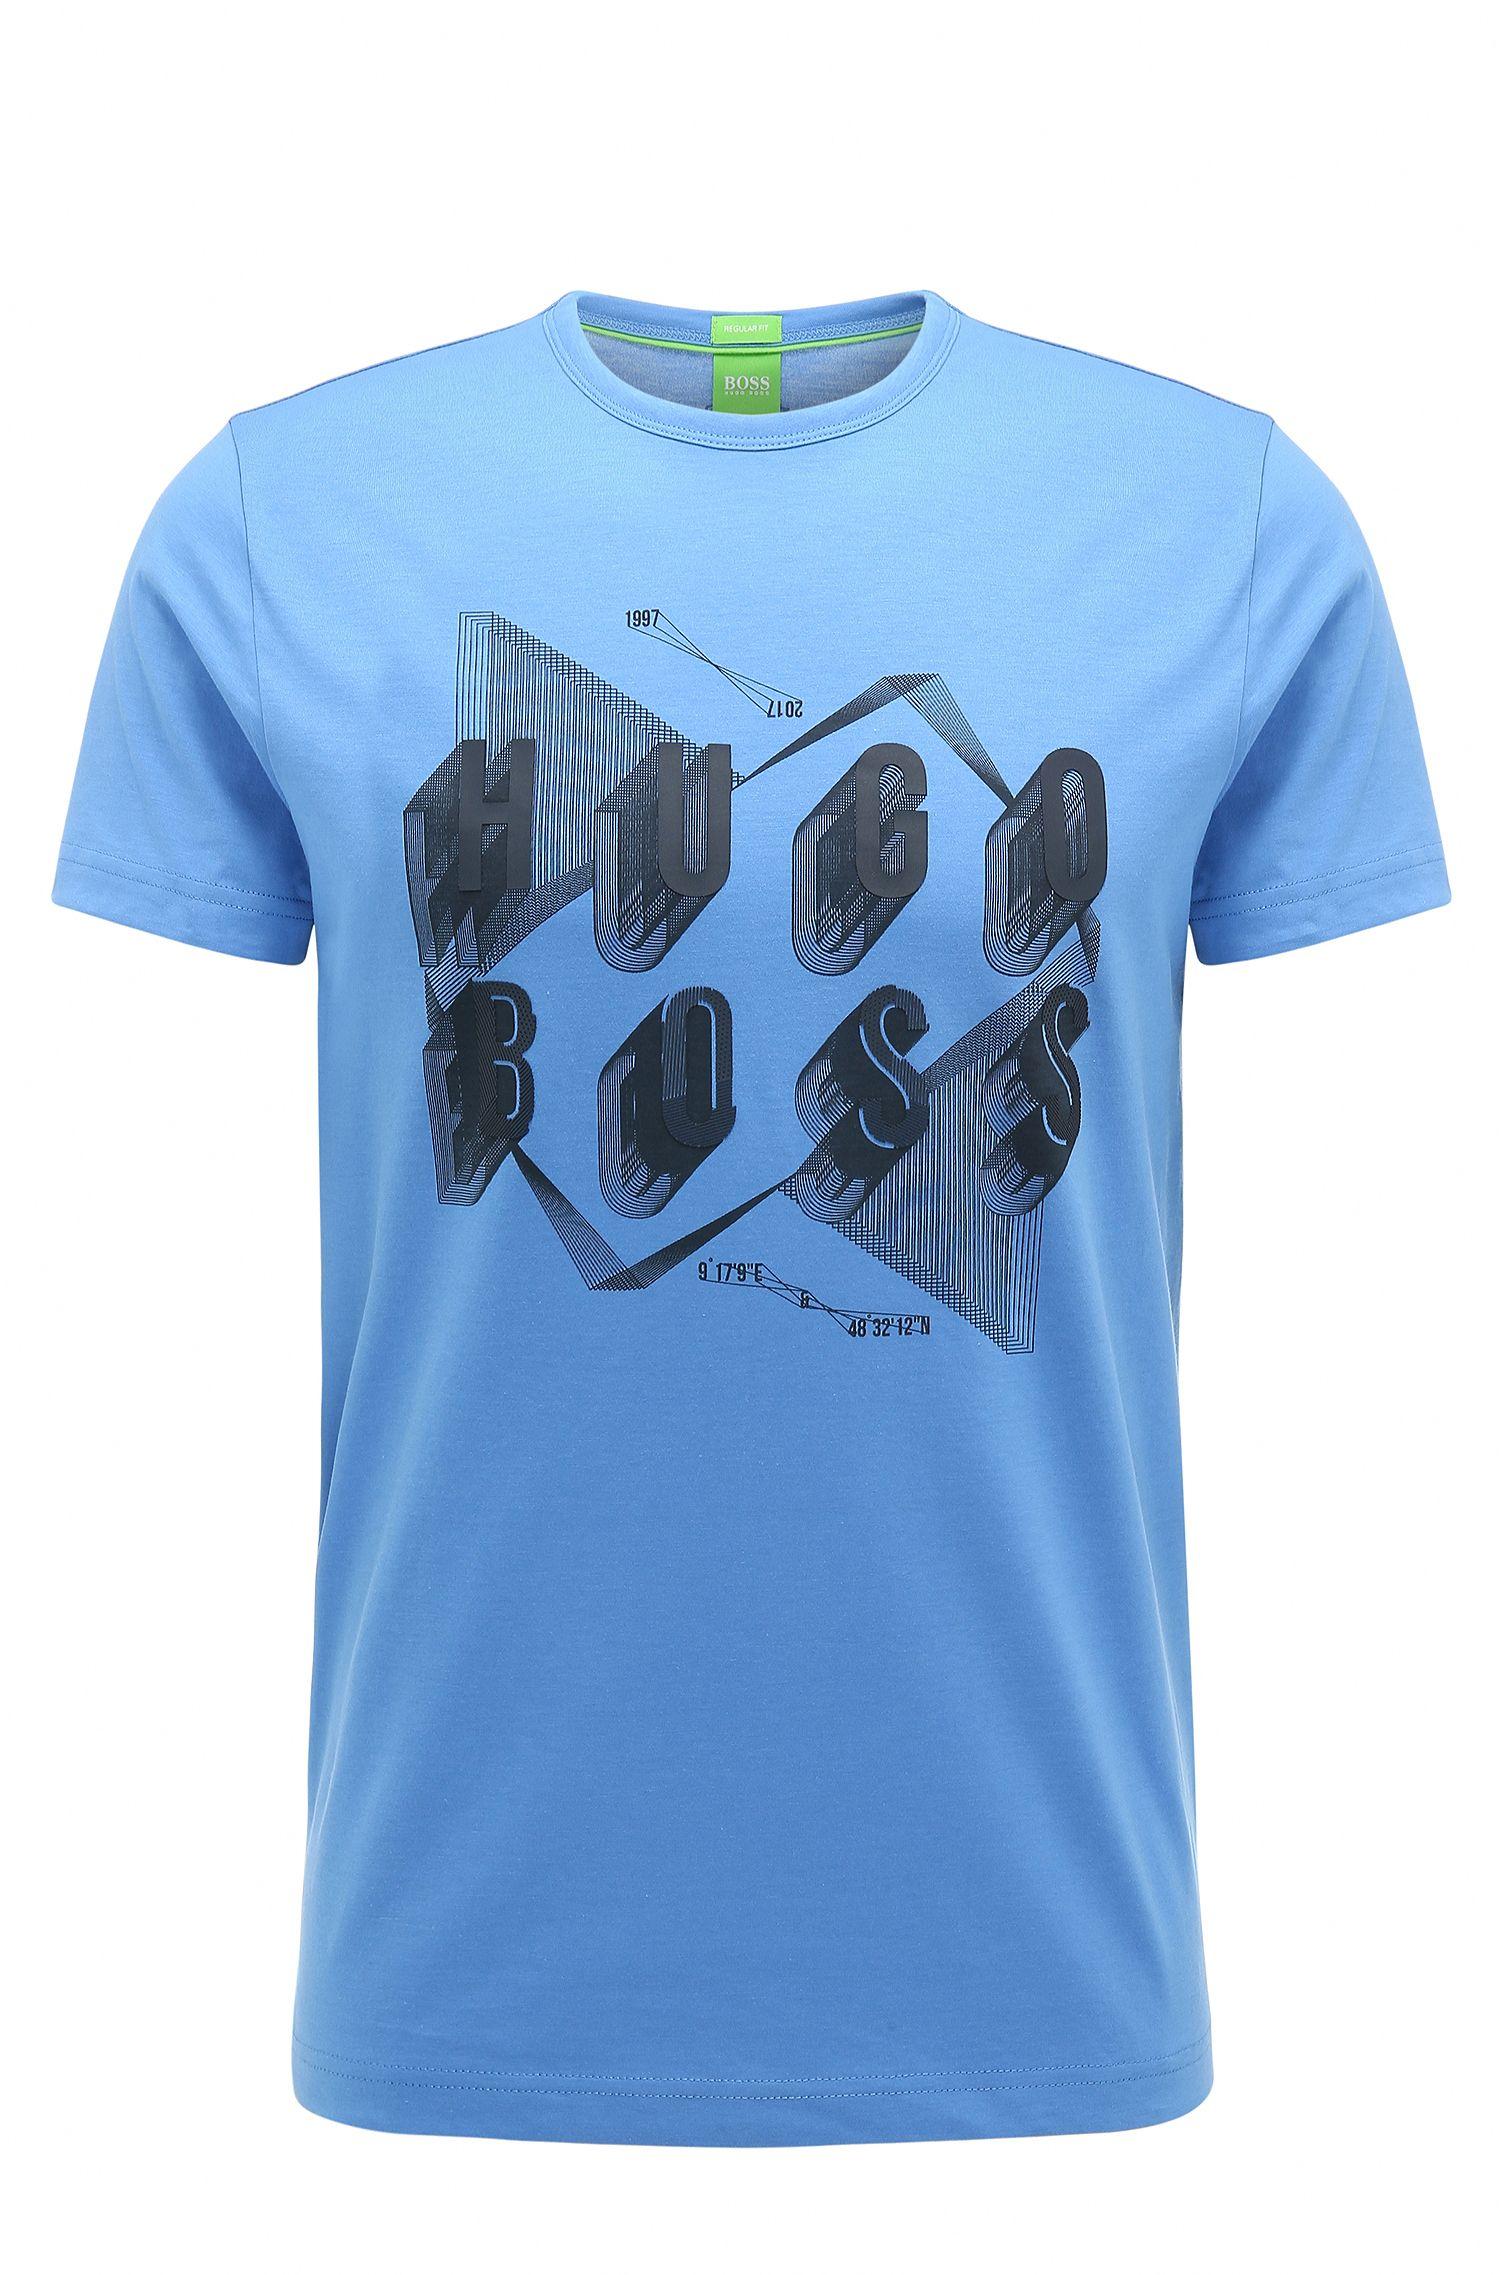 Regular-Fit T-Shirt aus Baumwolle mit markantem Print